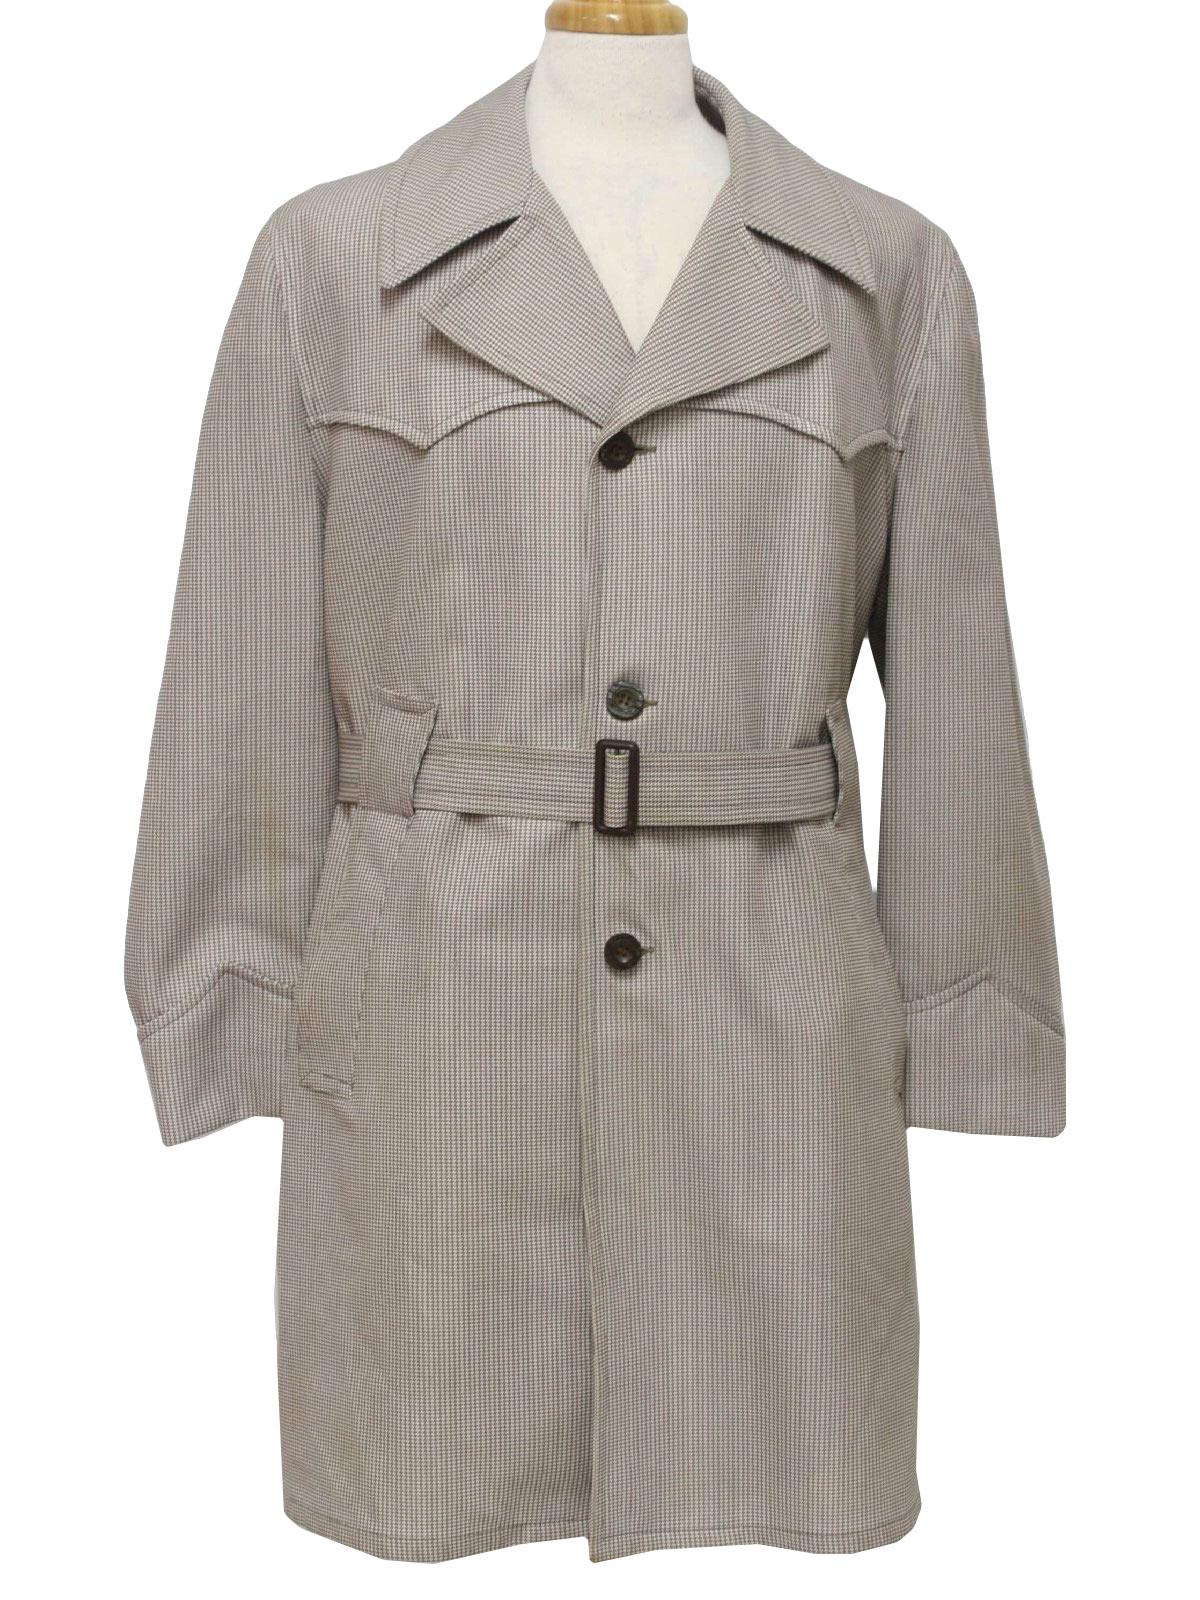 Italian Cashmere Coats, Mens Cashmere Pea Coat, Camel Cashmere Coat